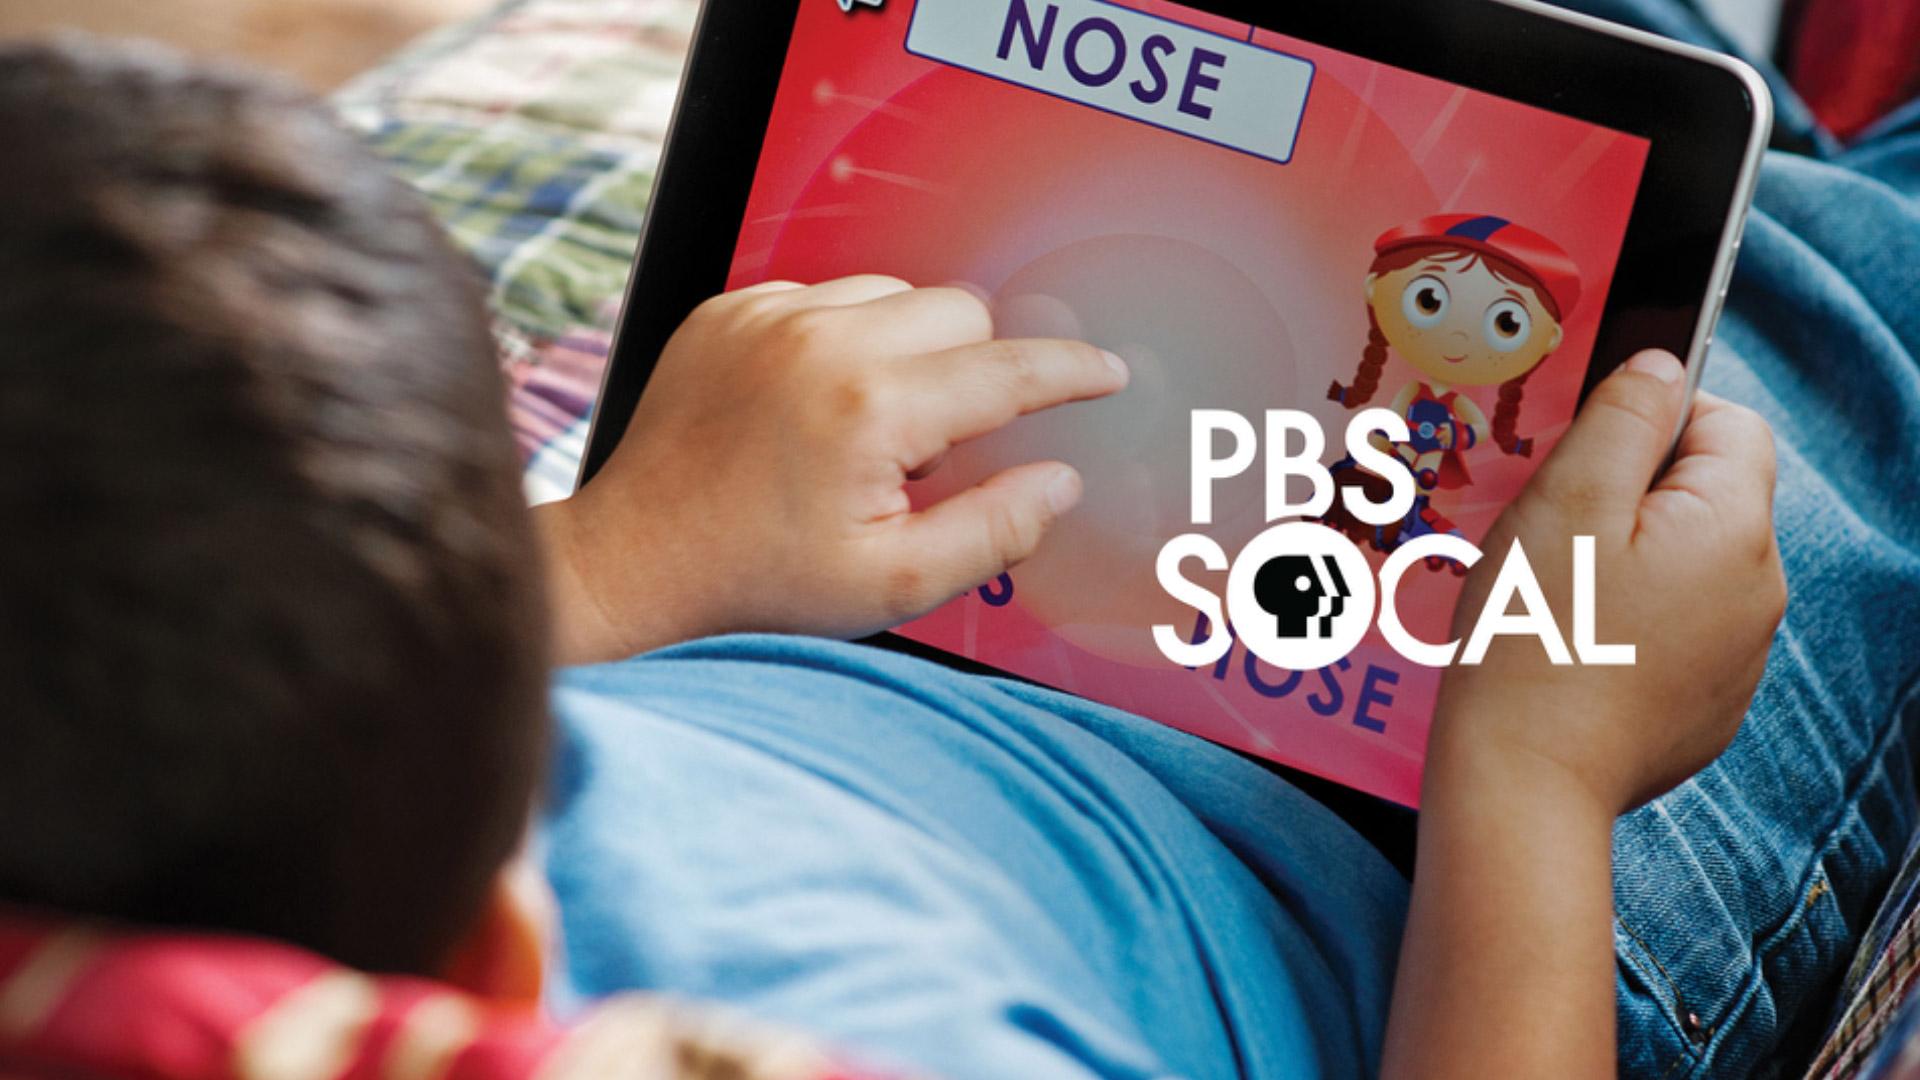 PBS Socal